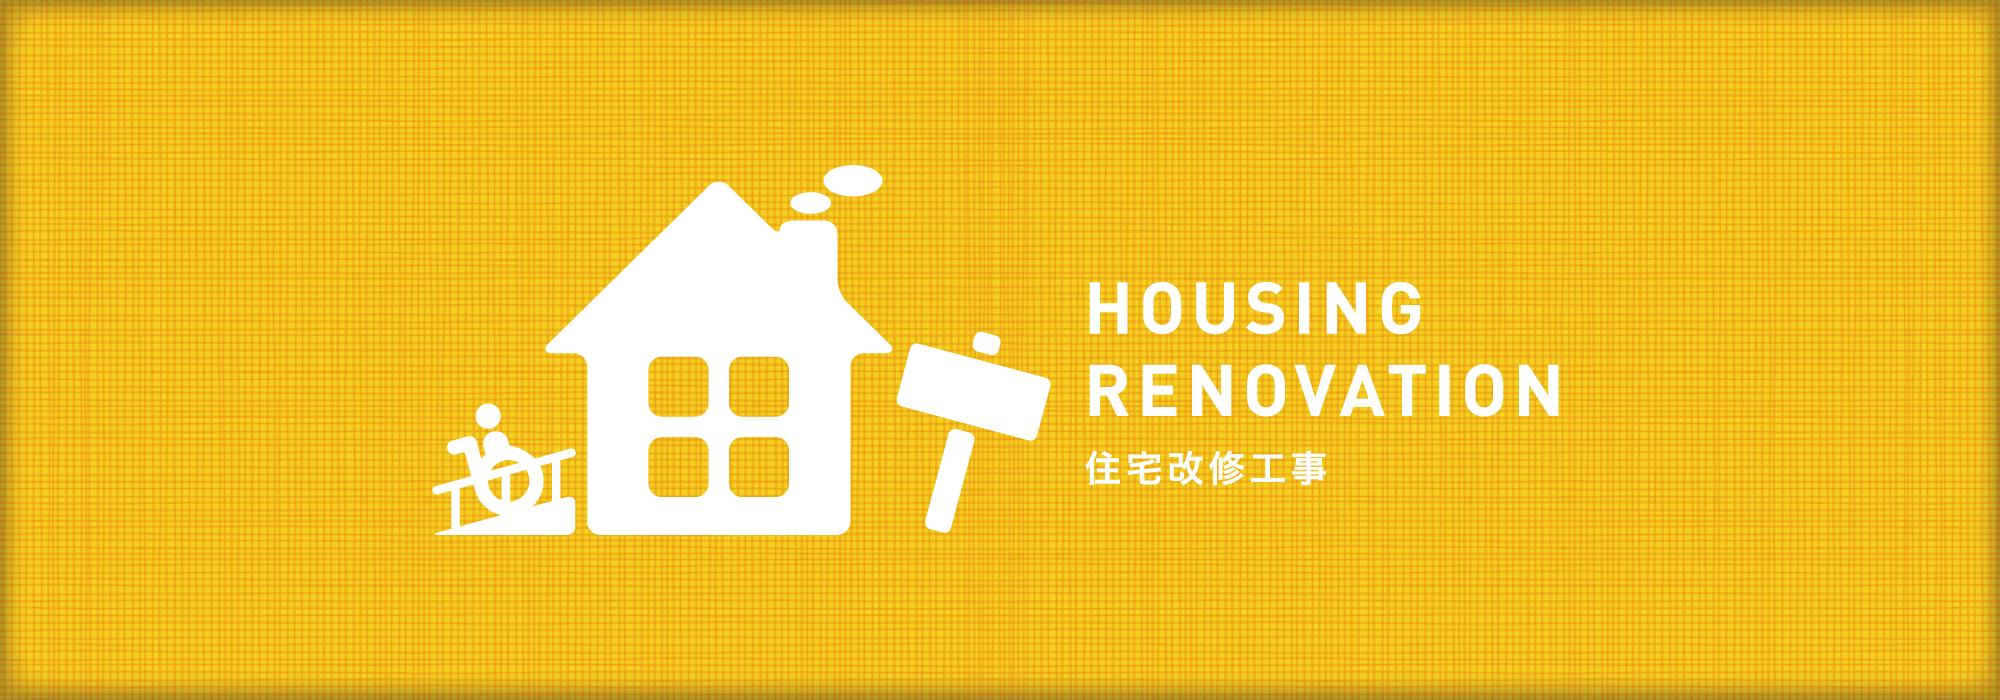 HOUSING RENOVATION 住宅改修工事